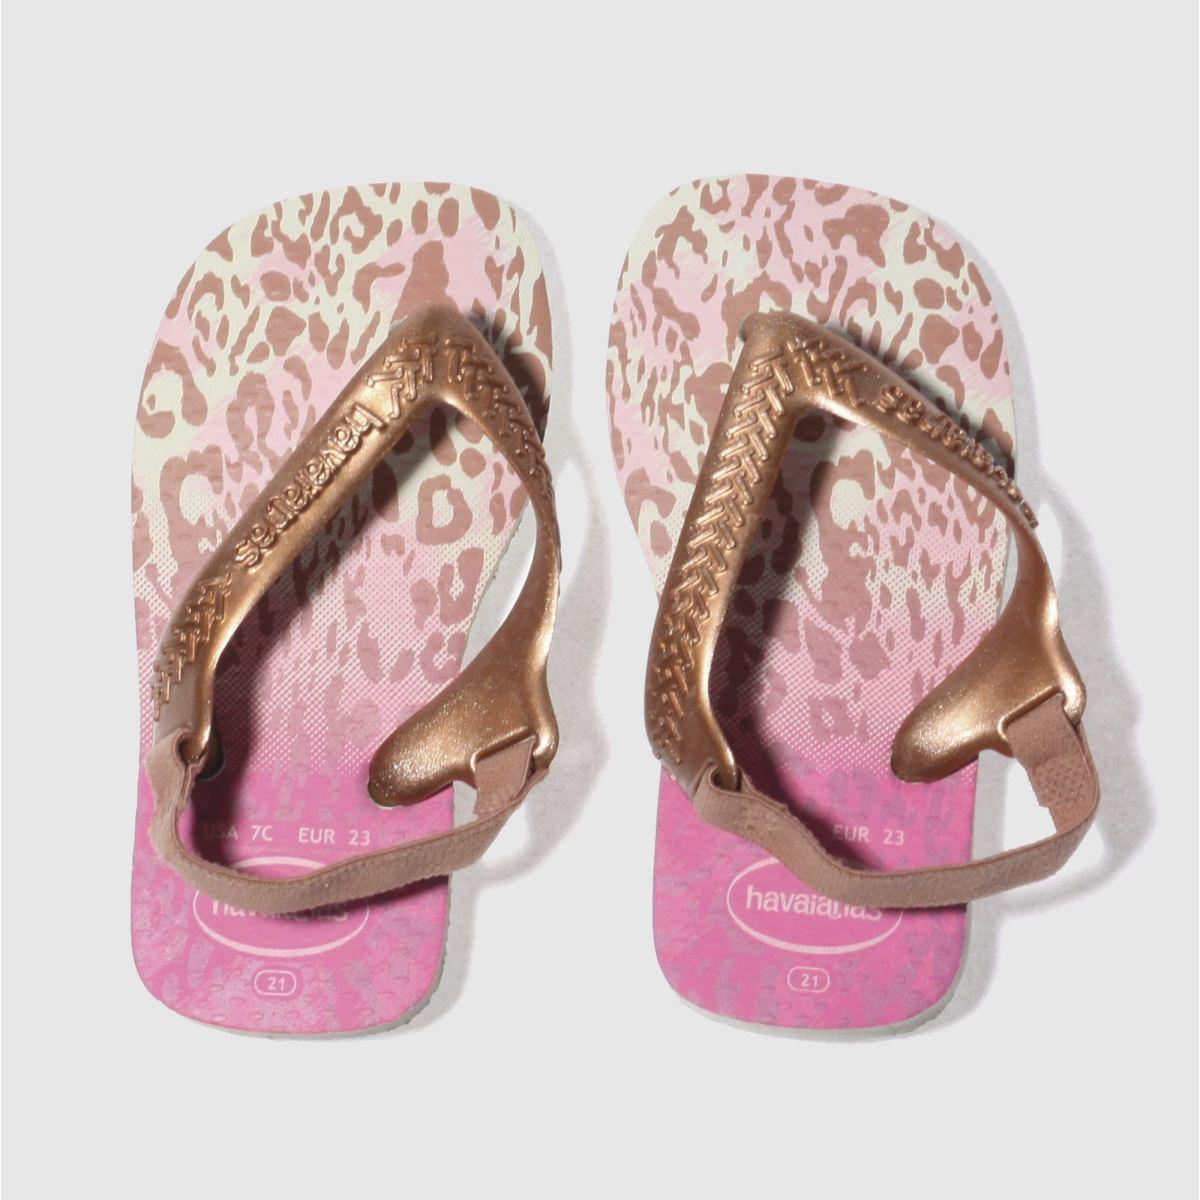 Havaianas Pink Chic Ii Girls Toddler Sandals